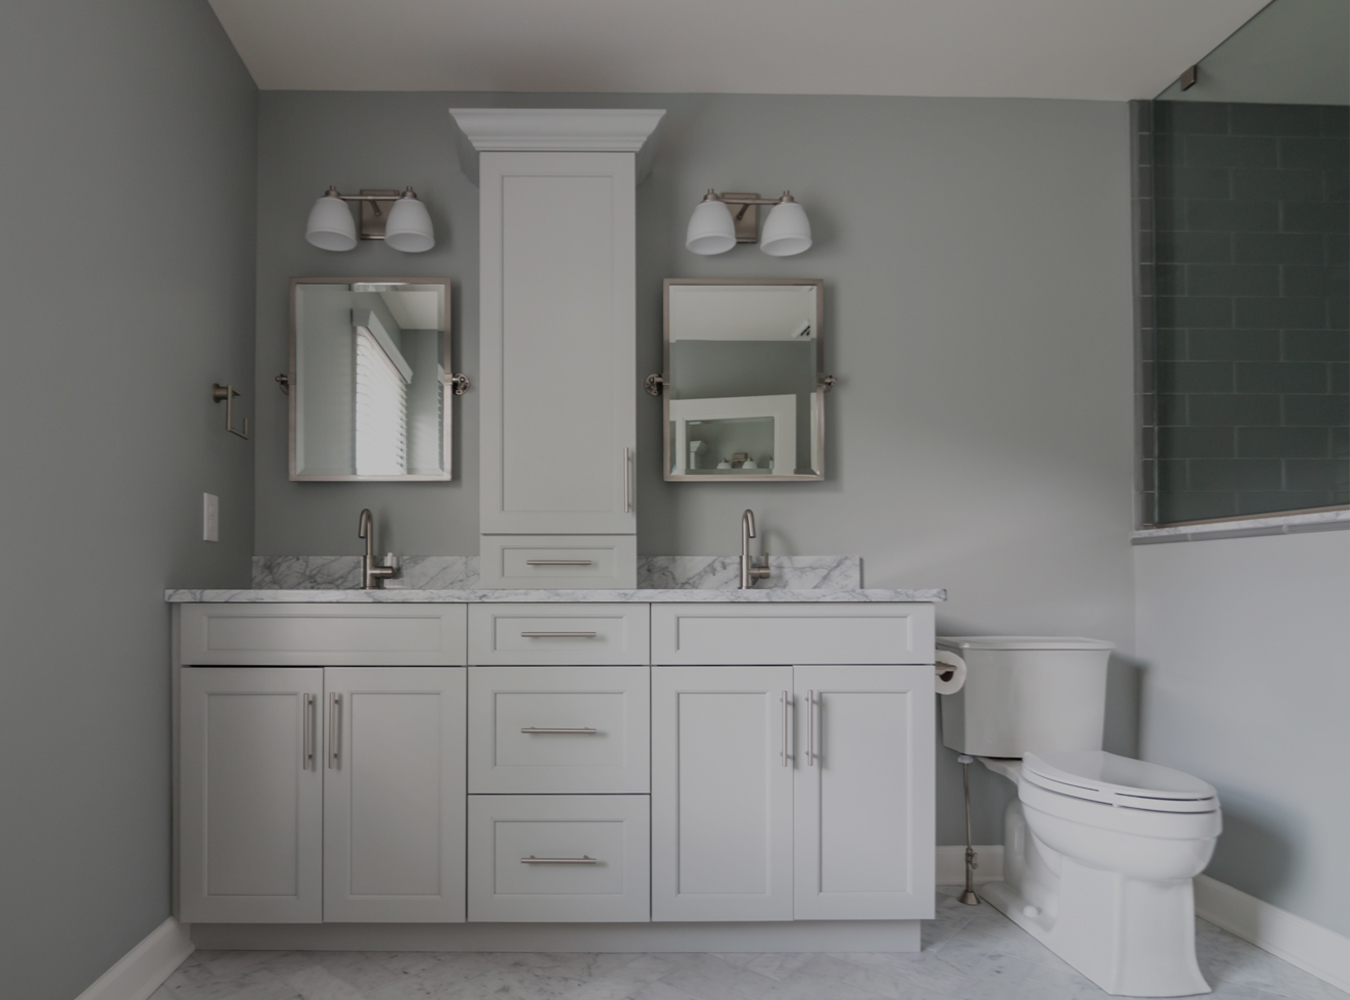 kbdlv kitchen remodeling york pa Bath design contractor Lehigh Valley PA